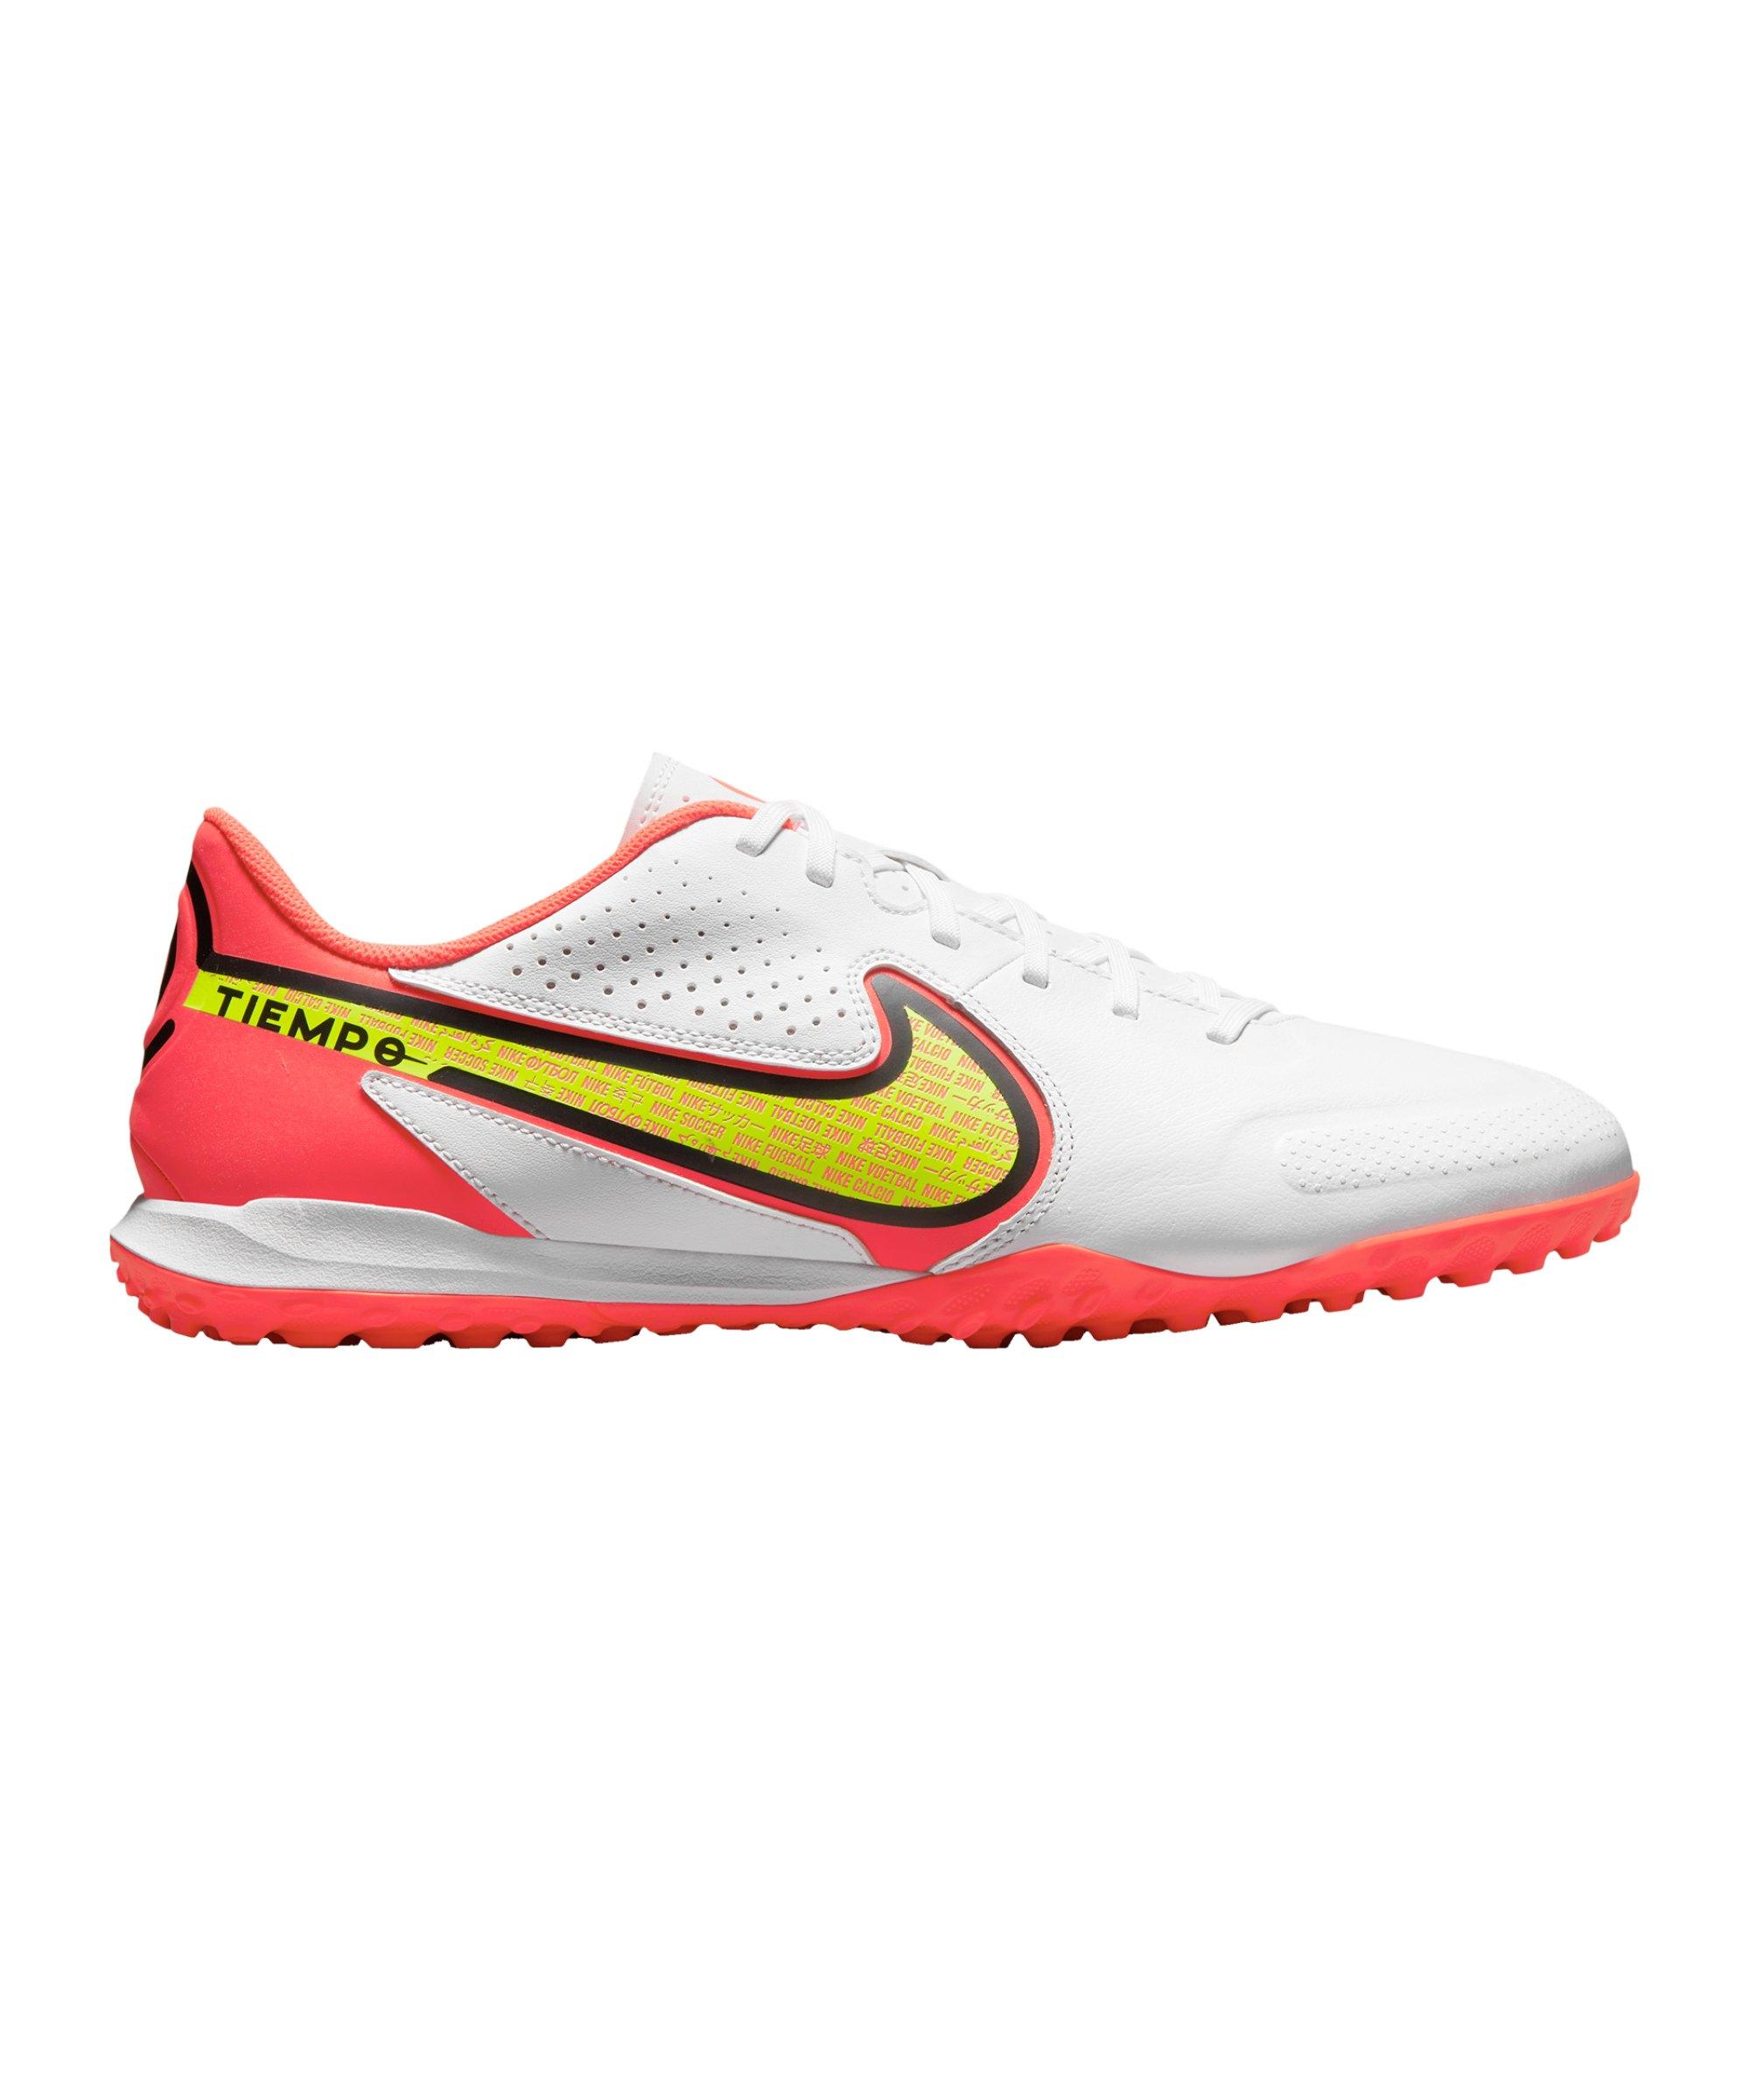 Nike Tiempo Legend IX Motivation Academy TF Weiss Gelb Rot F176 - weiss